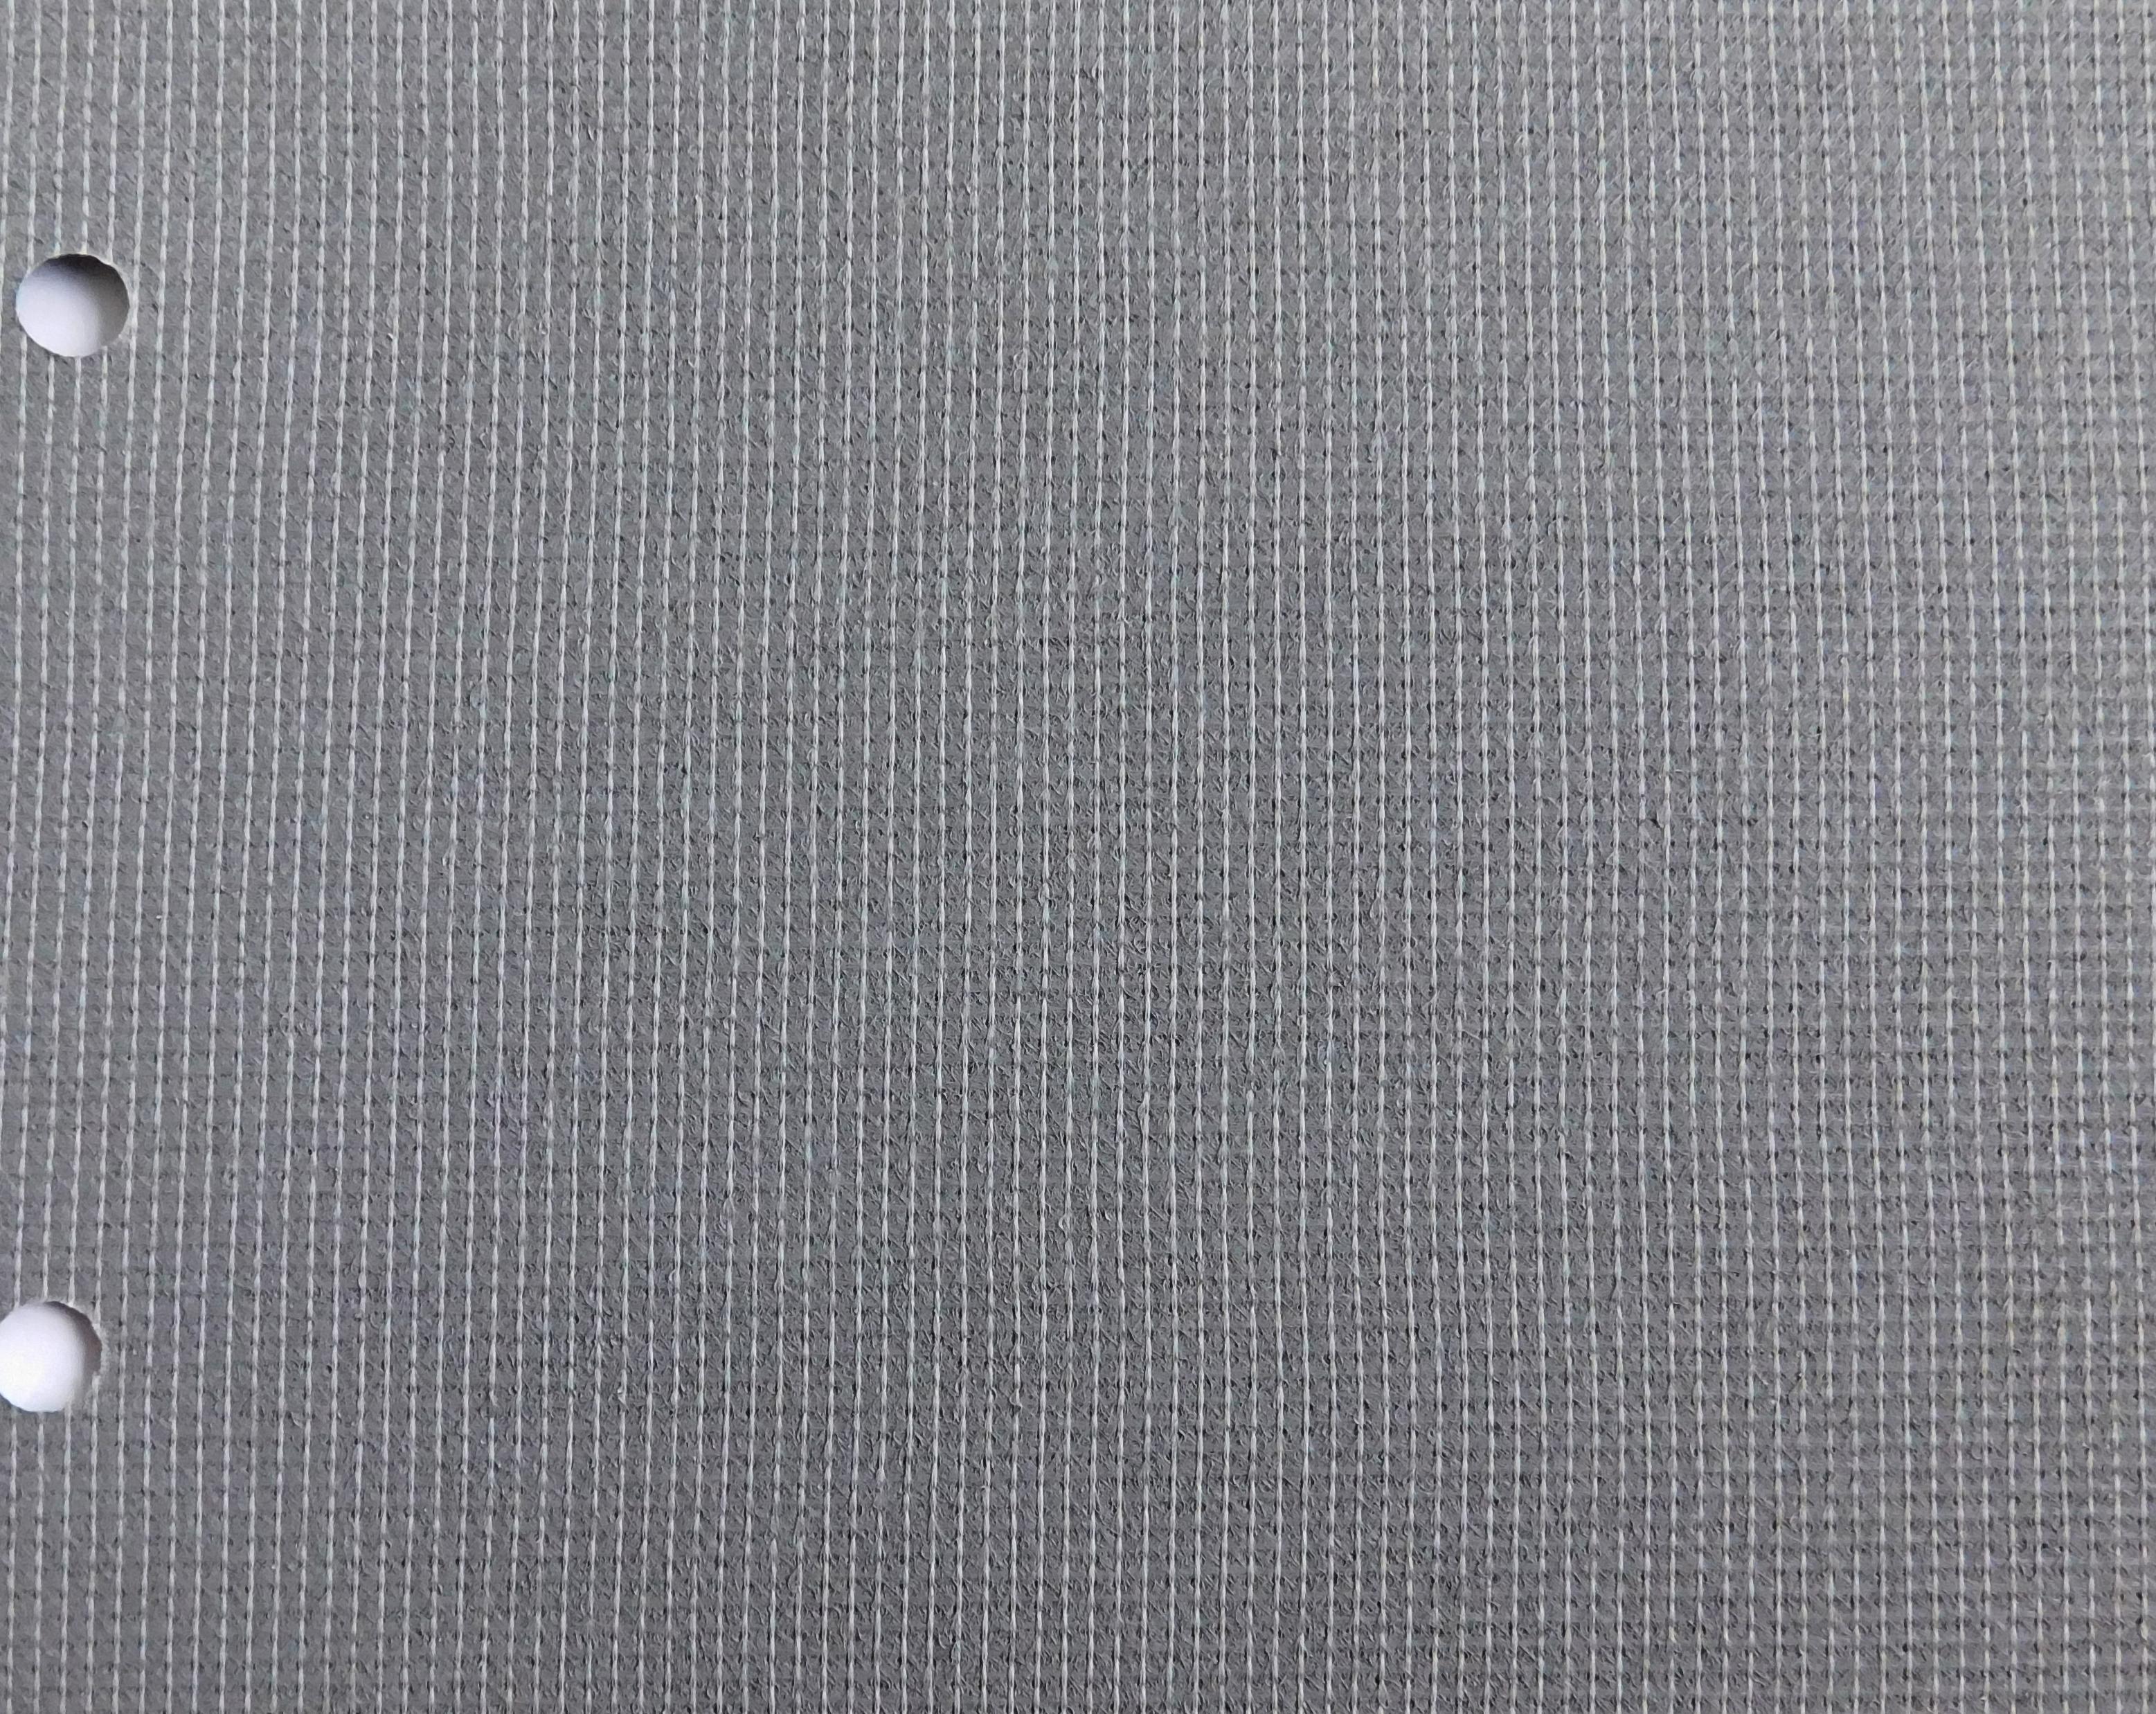 Buy Atlantex Asc Grey Vertical Blinds Solar Reflective